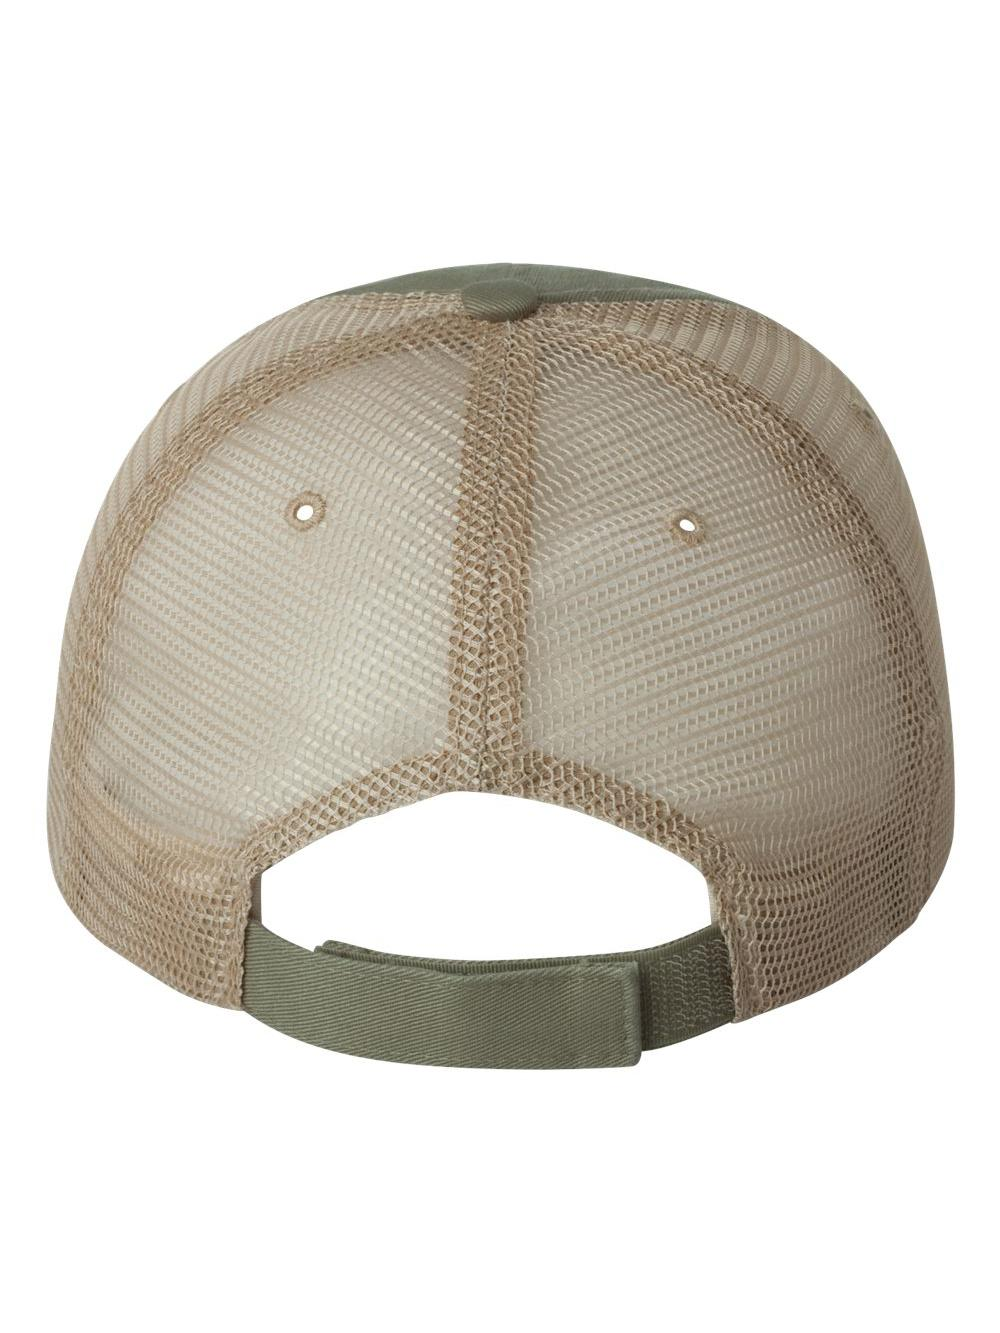 Mega Cap Organic Cotton//Mesh Cap 6887